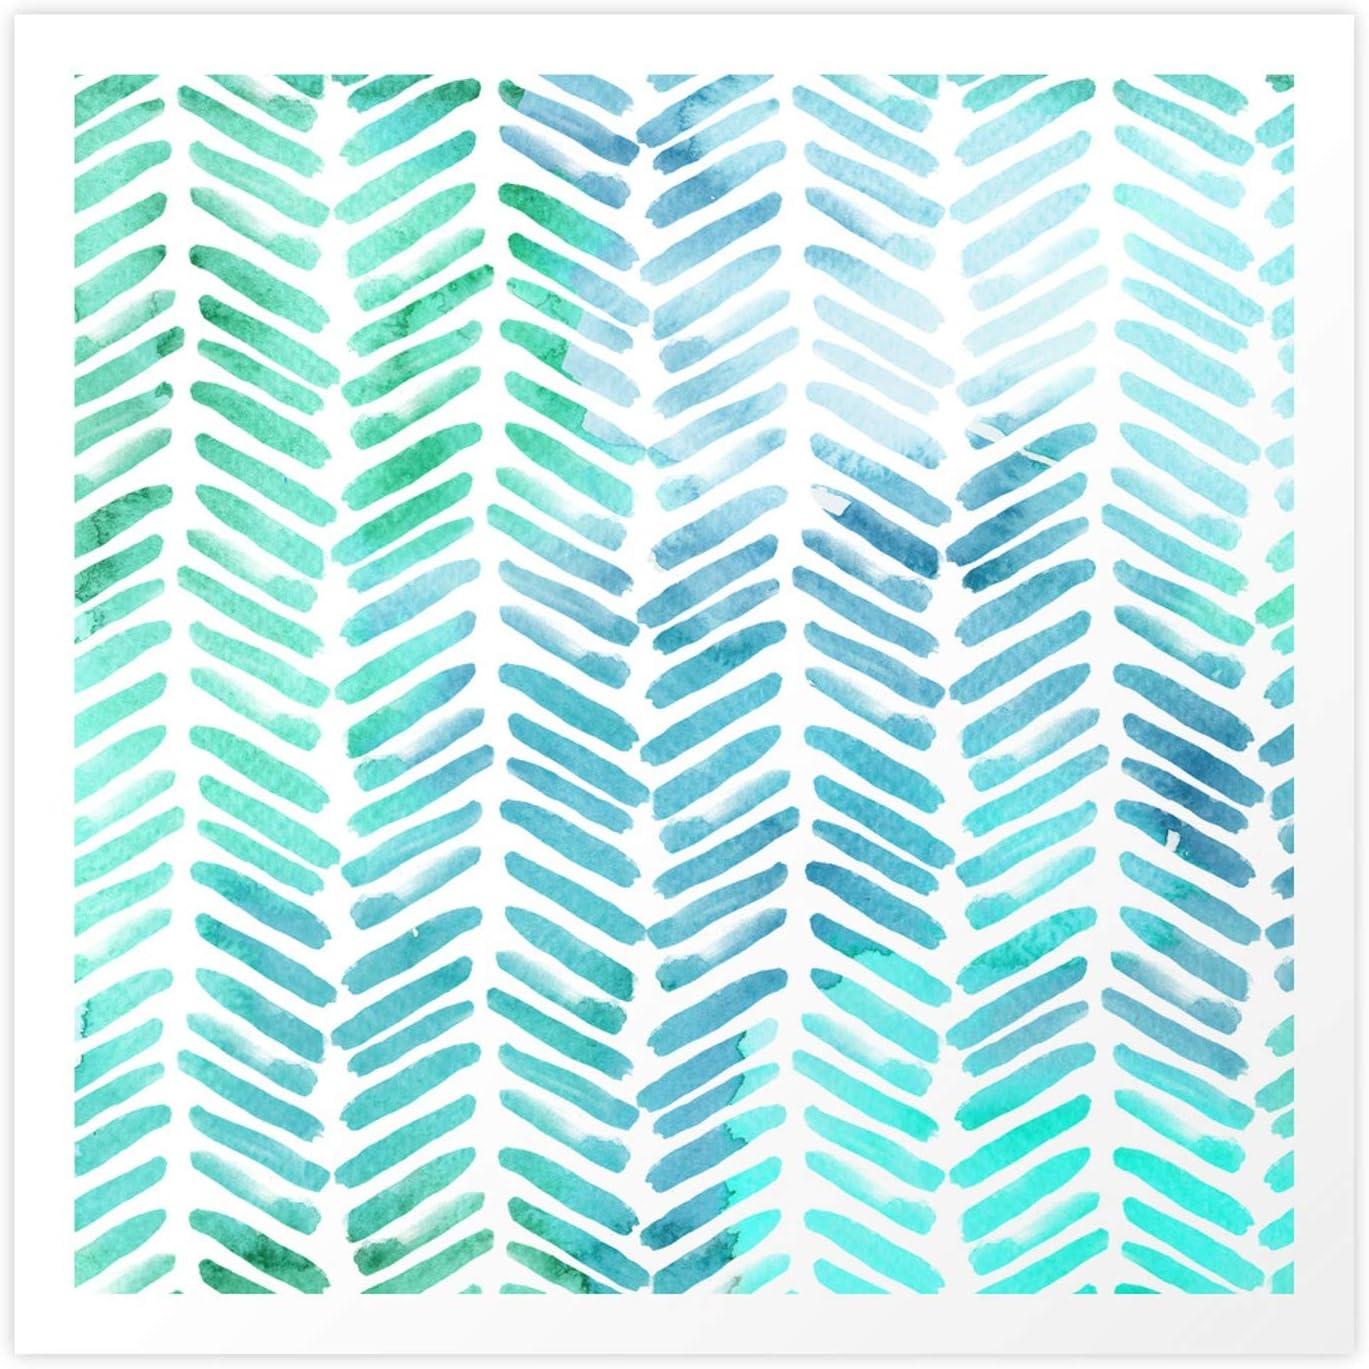 Handpainted Chevron Pattern - Light and Max 87% OFF Stripes by Aqua Tulsa Mall Green